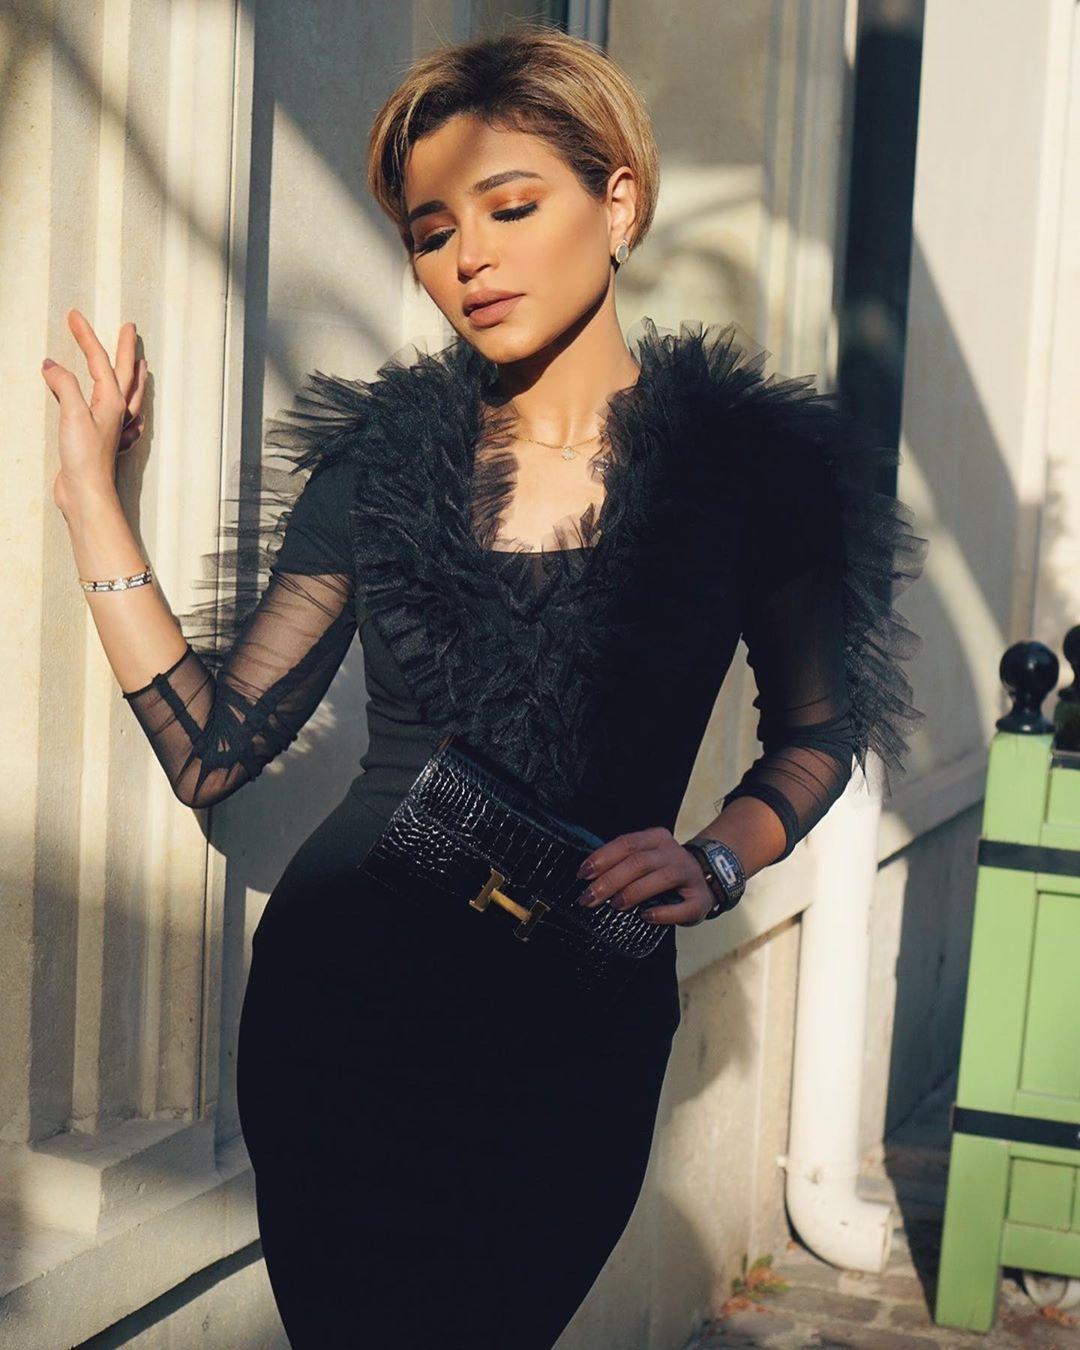 Pin By Sofijaolivera Design Team On Instagram Fashion Influencers Bodycon Dress Fashion Instagram Fashion